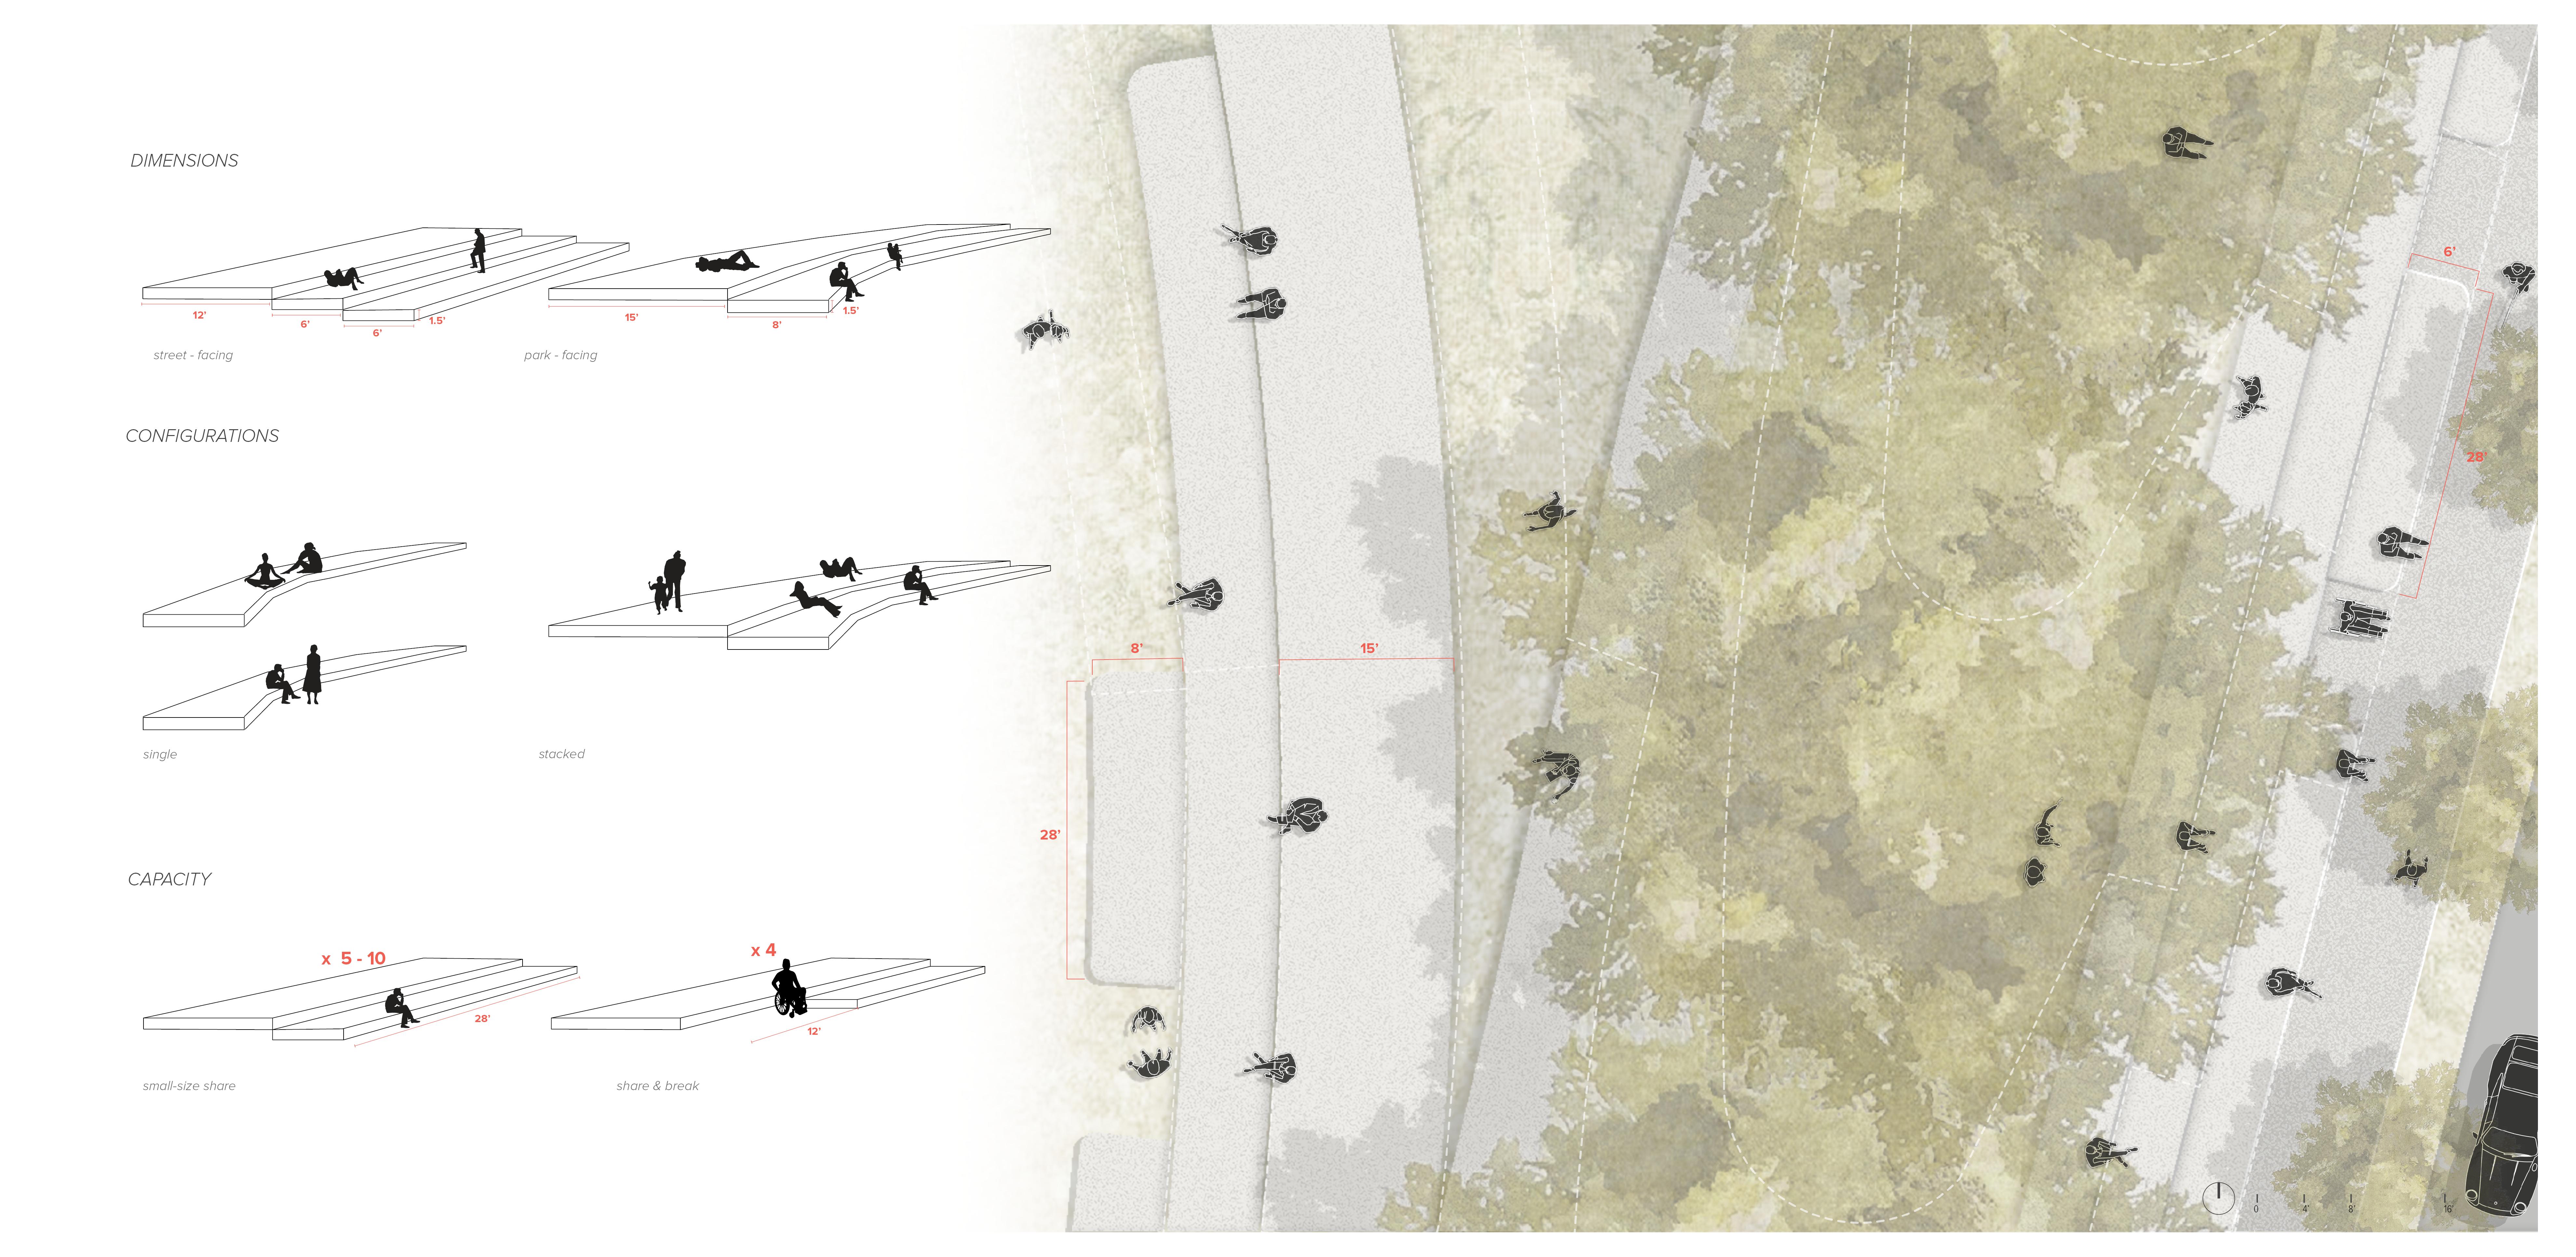 Focus Area Site Design - Experience of the Body